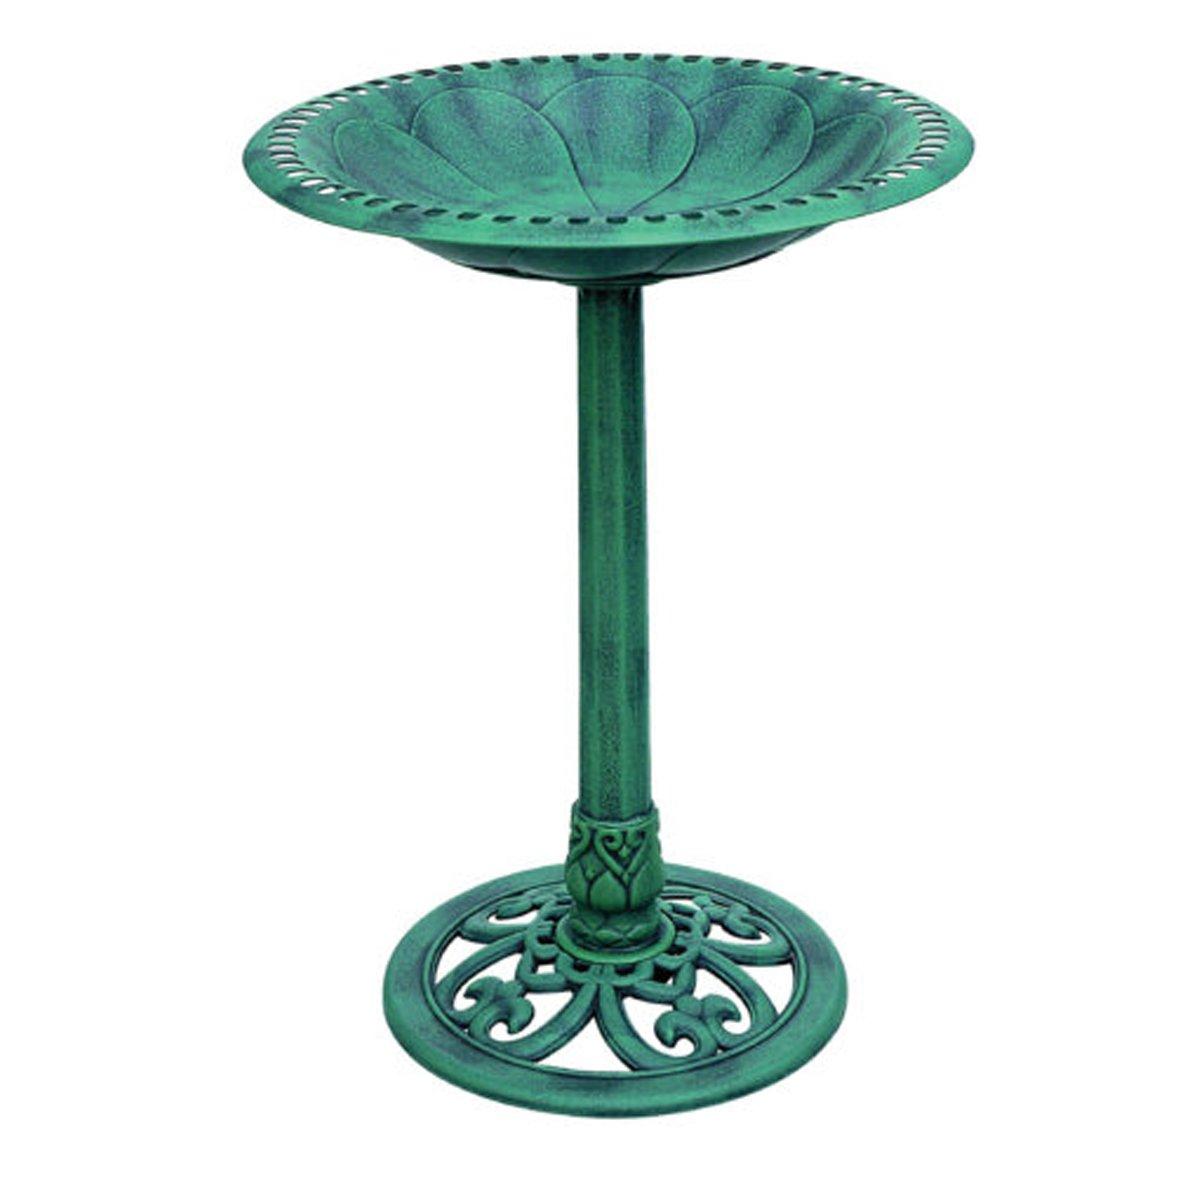 MS Home Antique Style Polyresin Round Green Bird Bath Feeder - Weather-Resistant - 19.6'' L x 19.6'' W x 27.3'' H